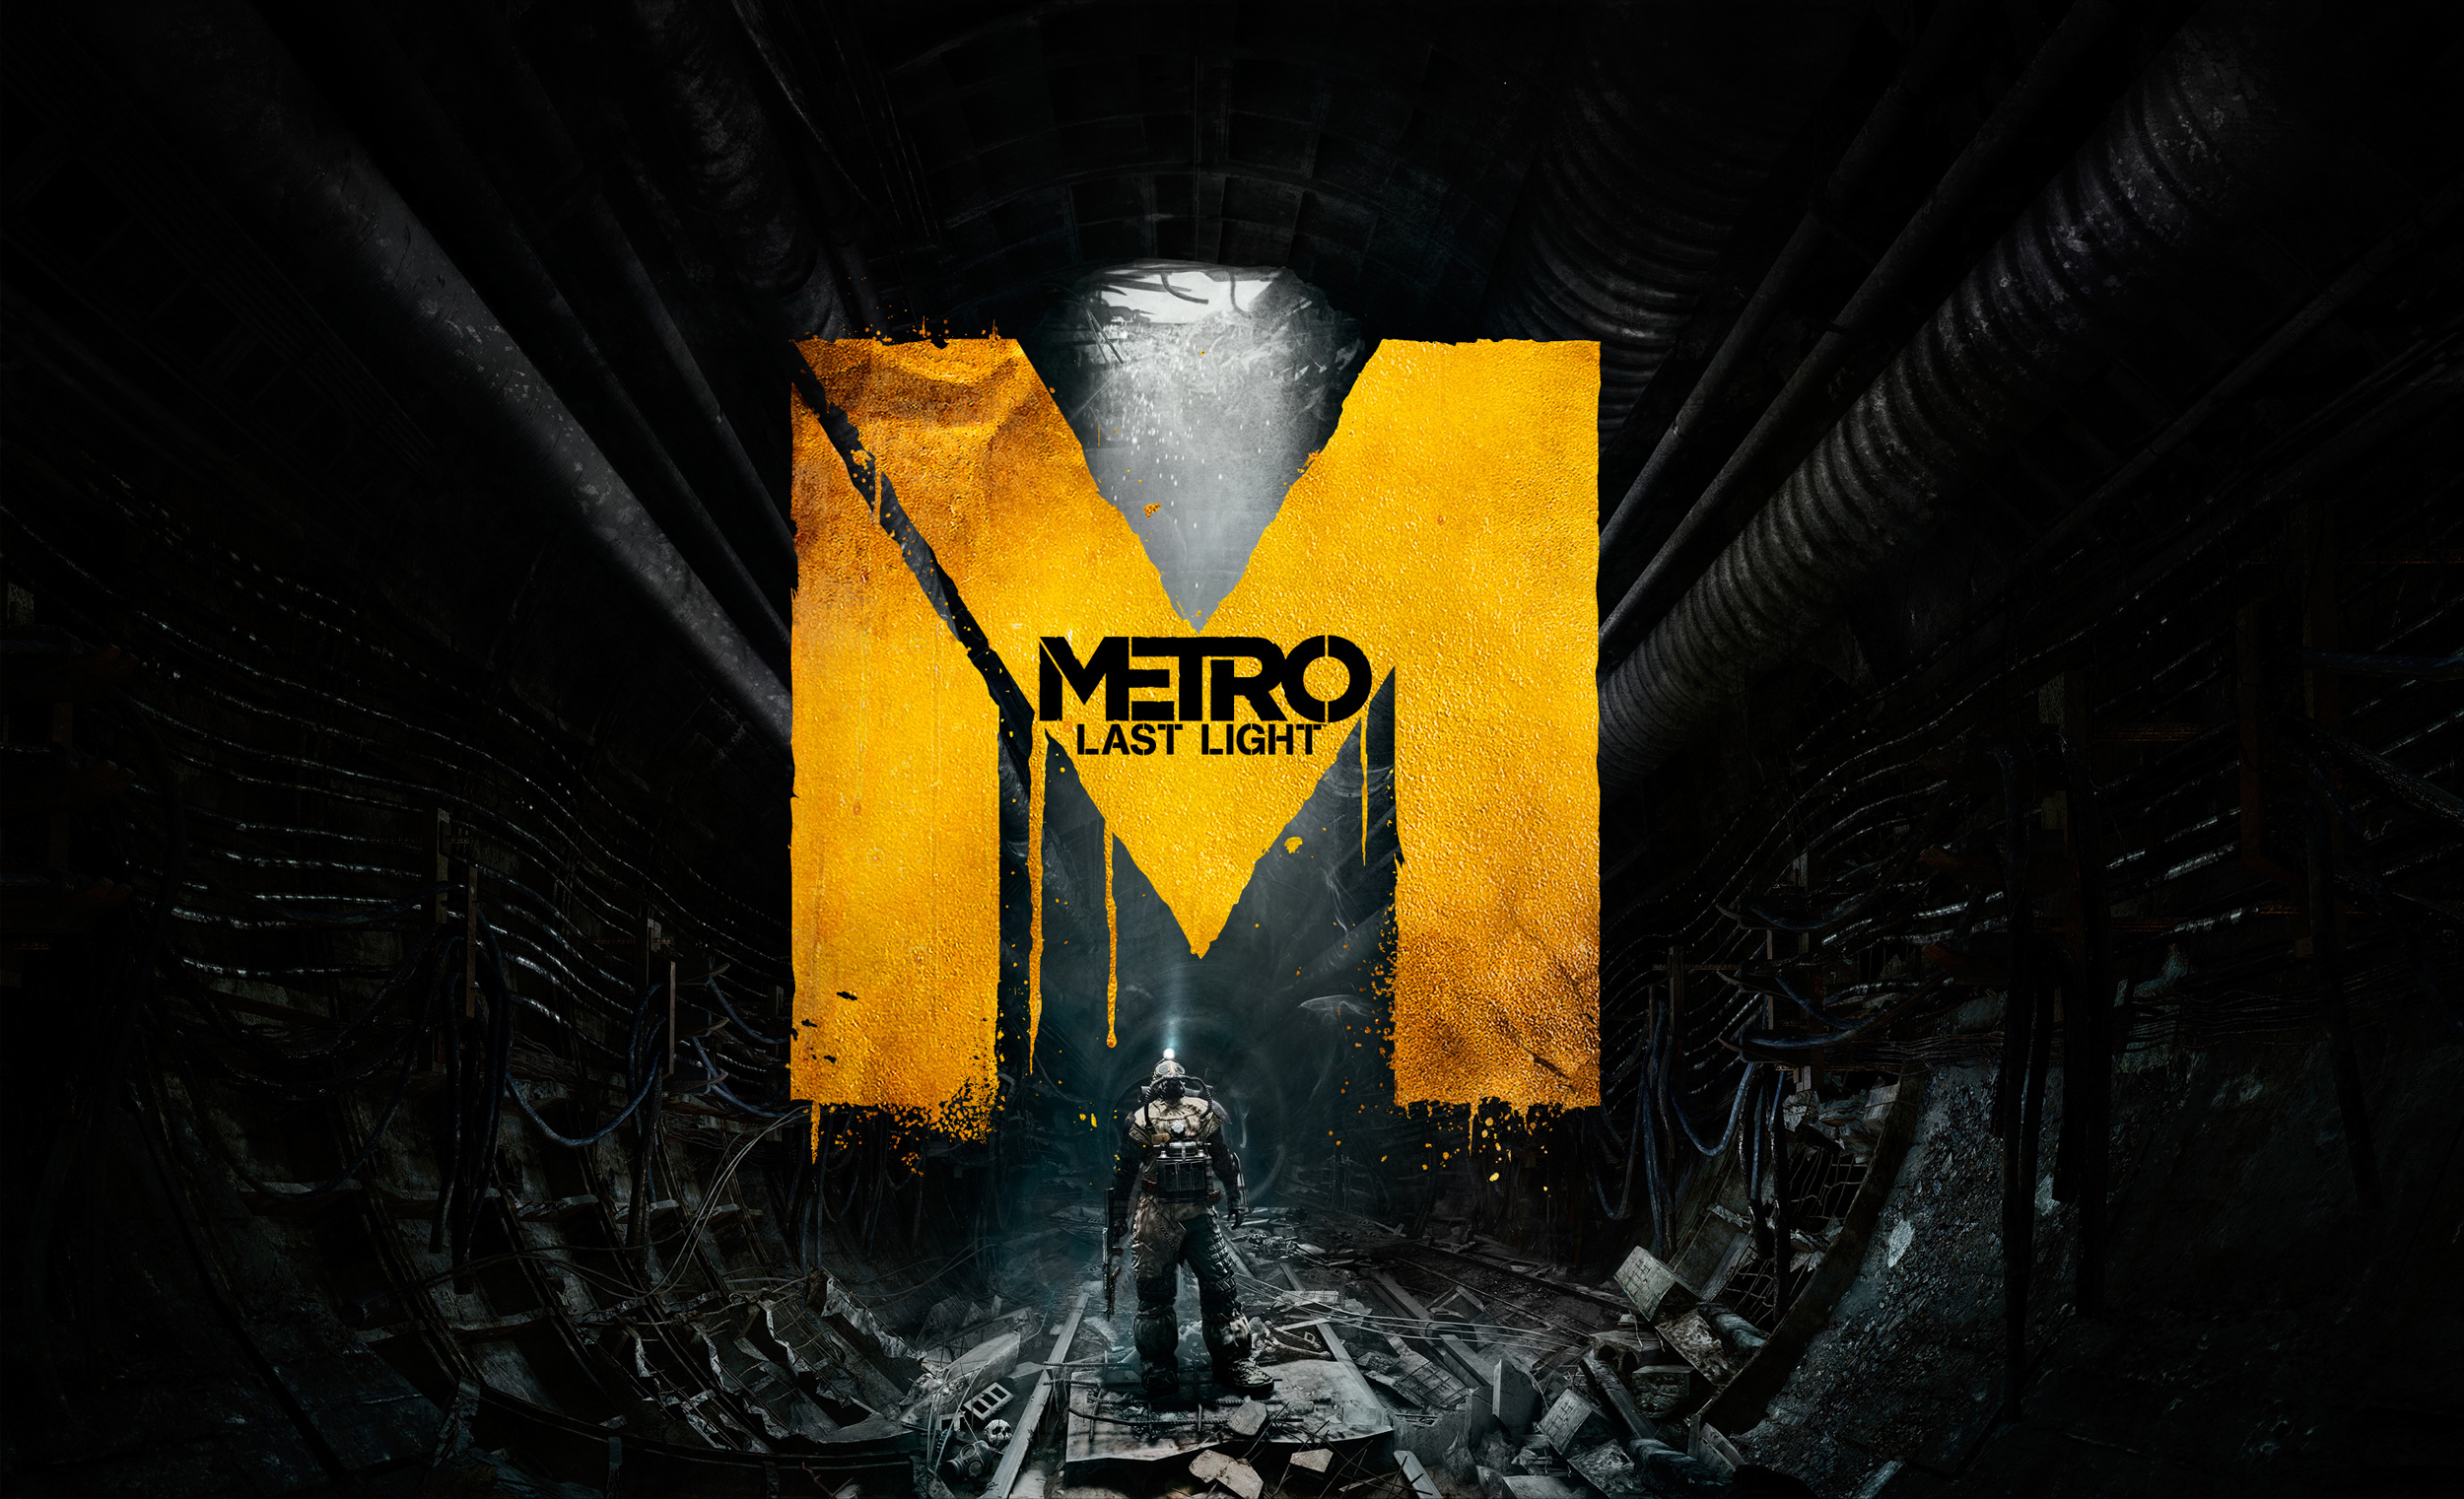 metro-last-light-b